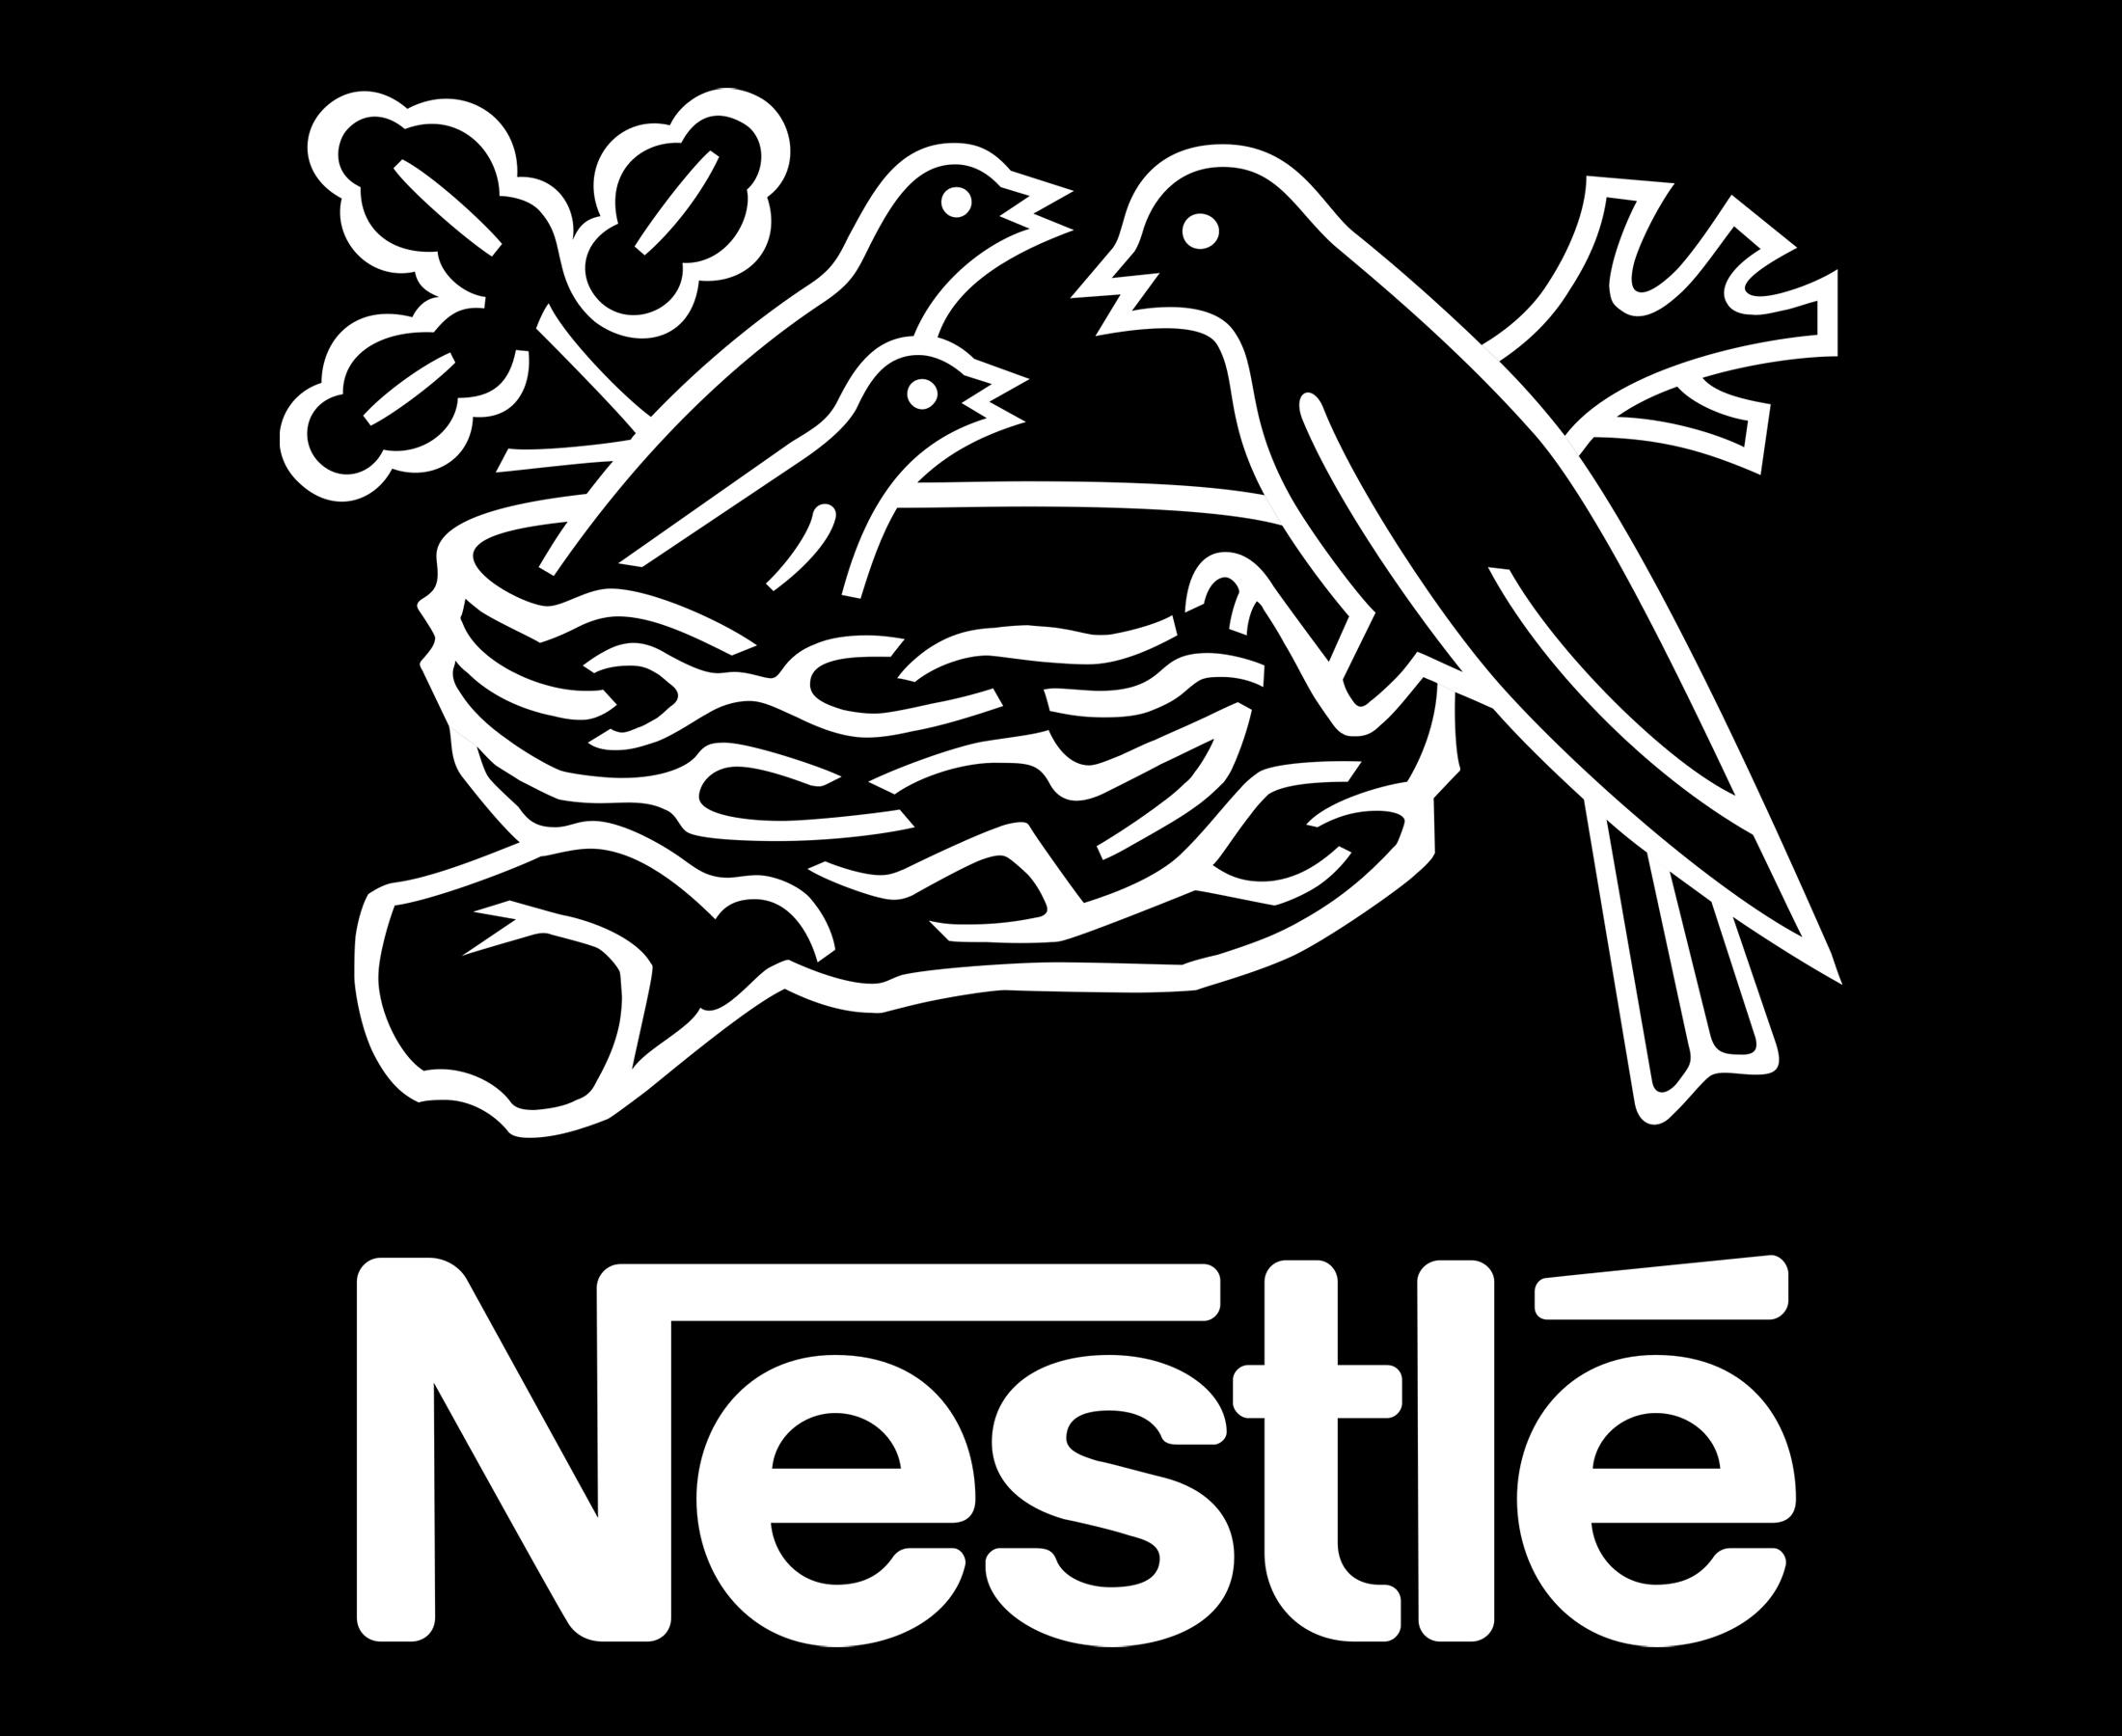 Nestlé Logo: Good food, Good life | Nestlé Global Logo